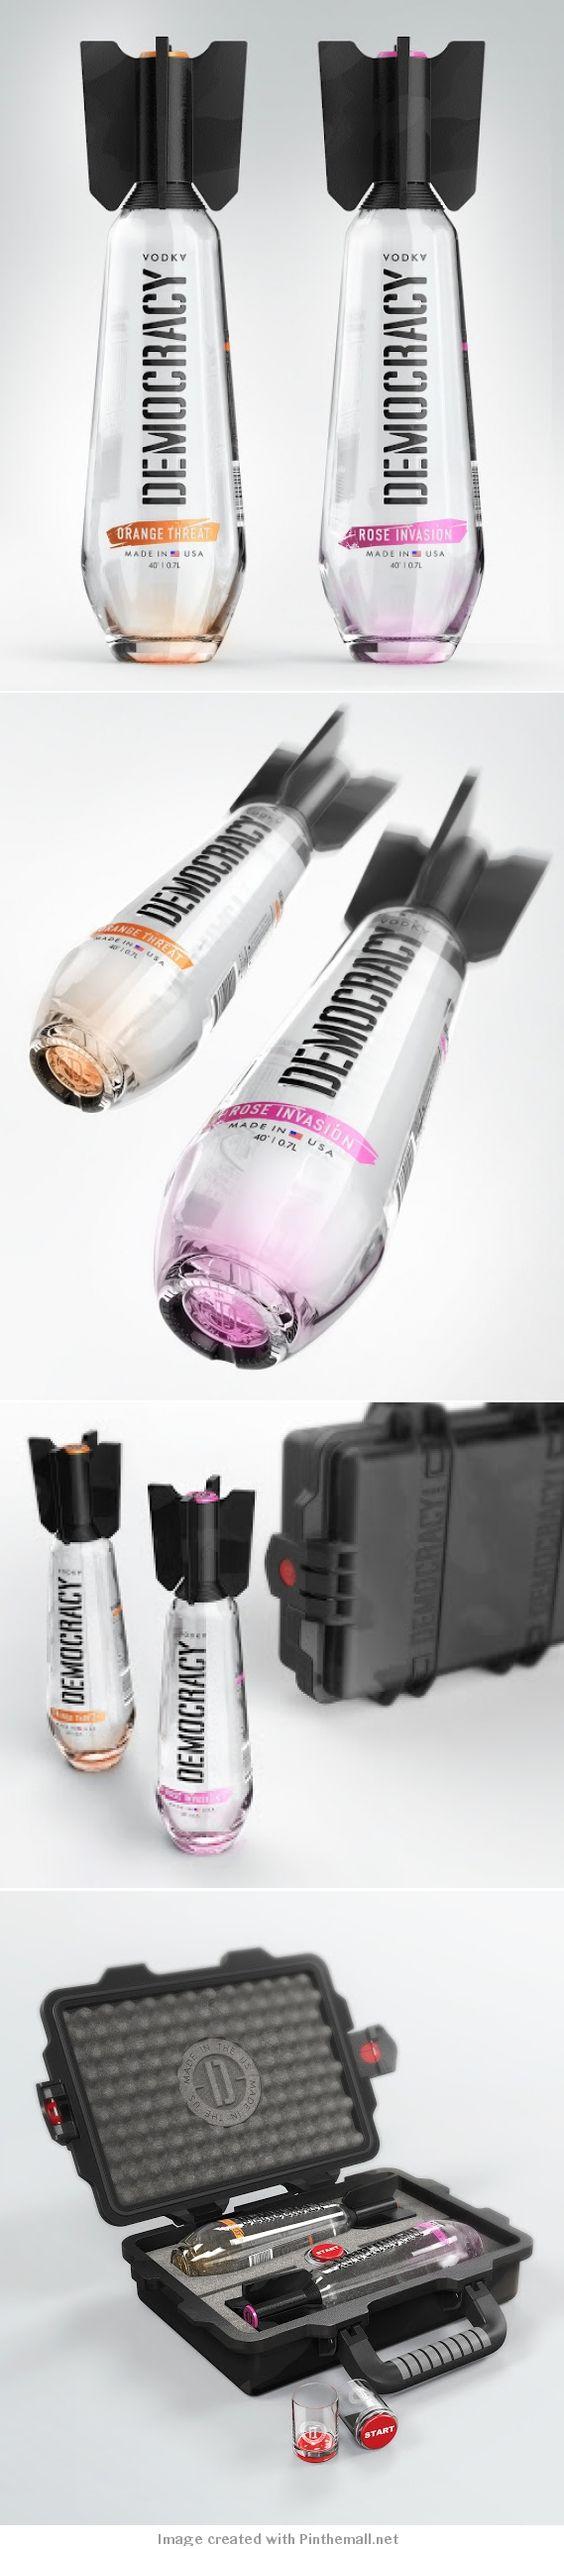 DEMOCRACY Vodka (Concept) Agency: STUDIOIN Designers: Arthur Schreiber, Galya Akhmetzyanova 3D: Maxim Kuliko: